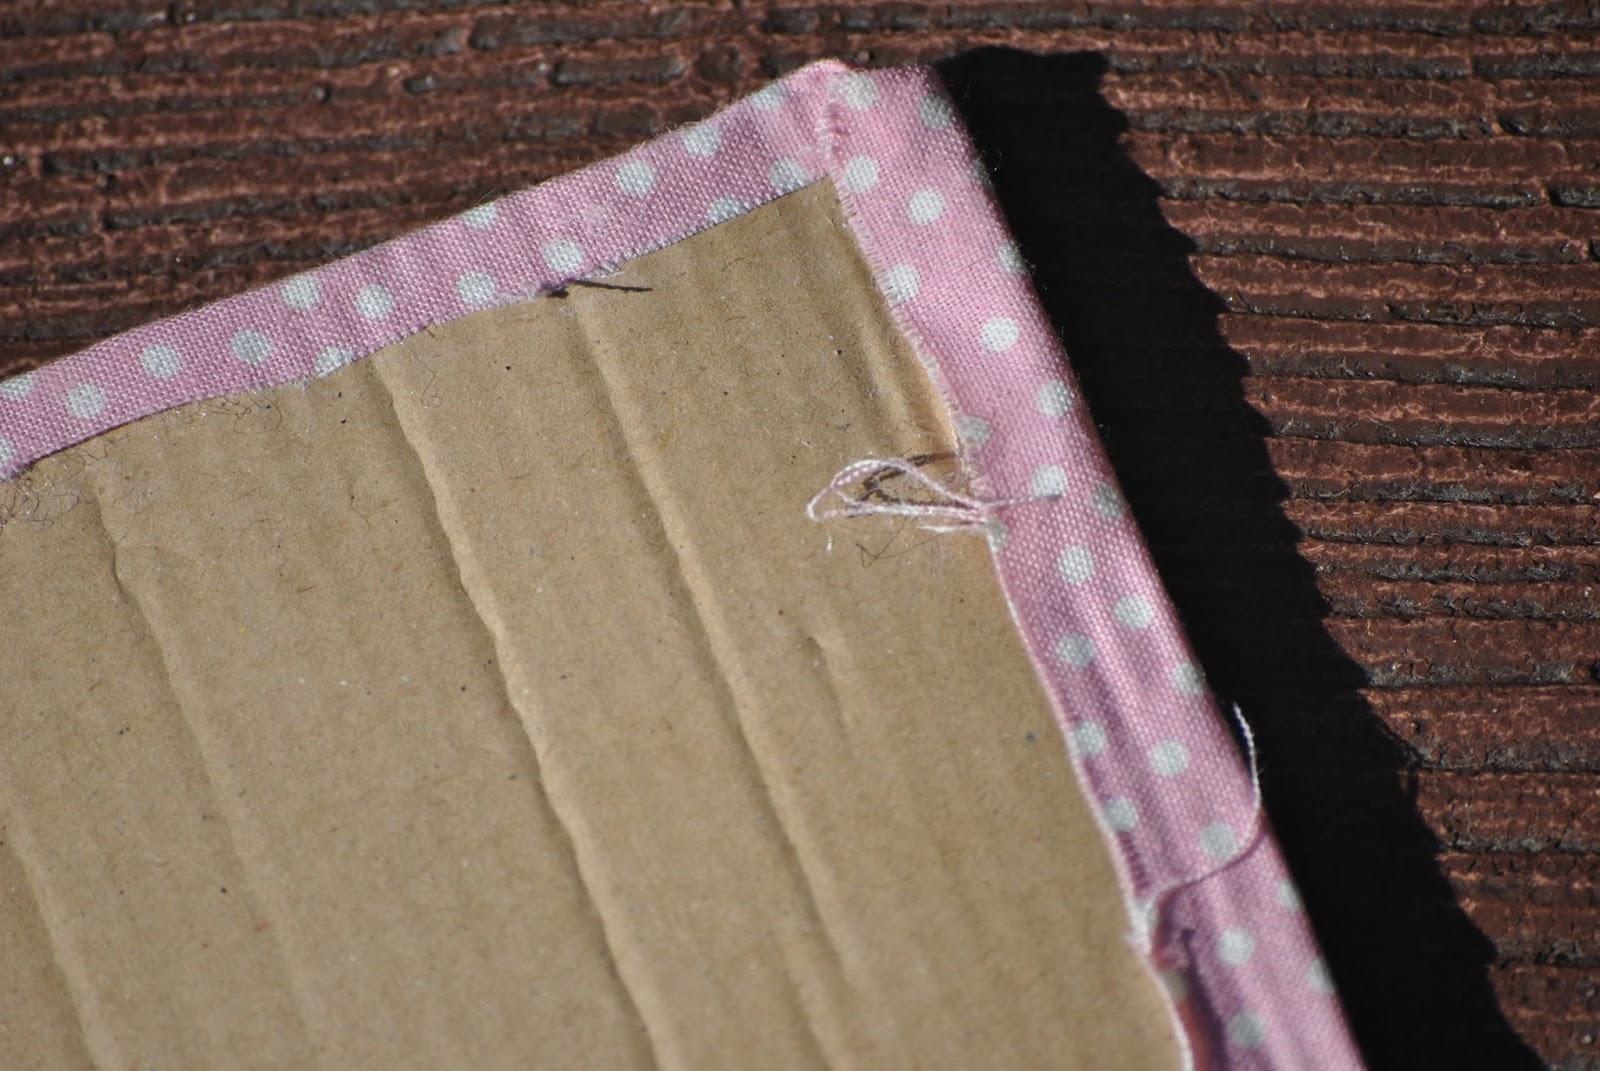 Forrar una caja de madera con tela paso a paso - Forrar sillas con tela ...